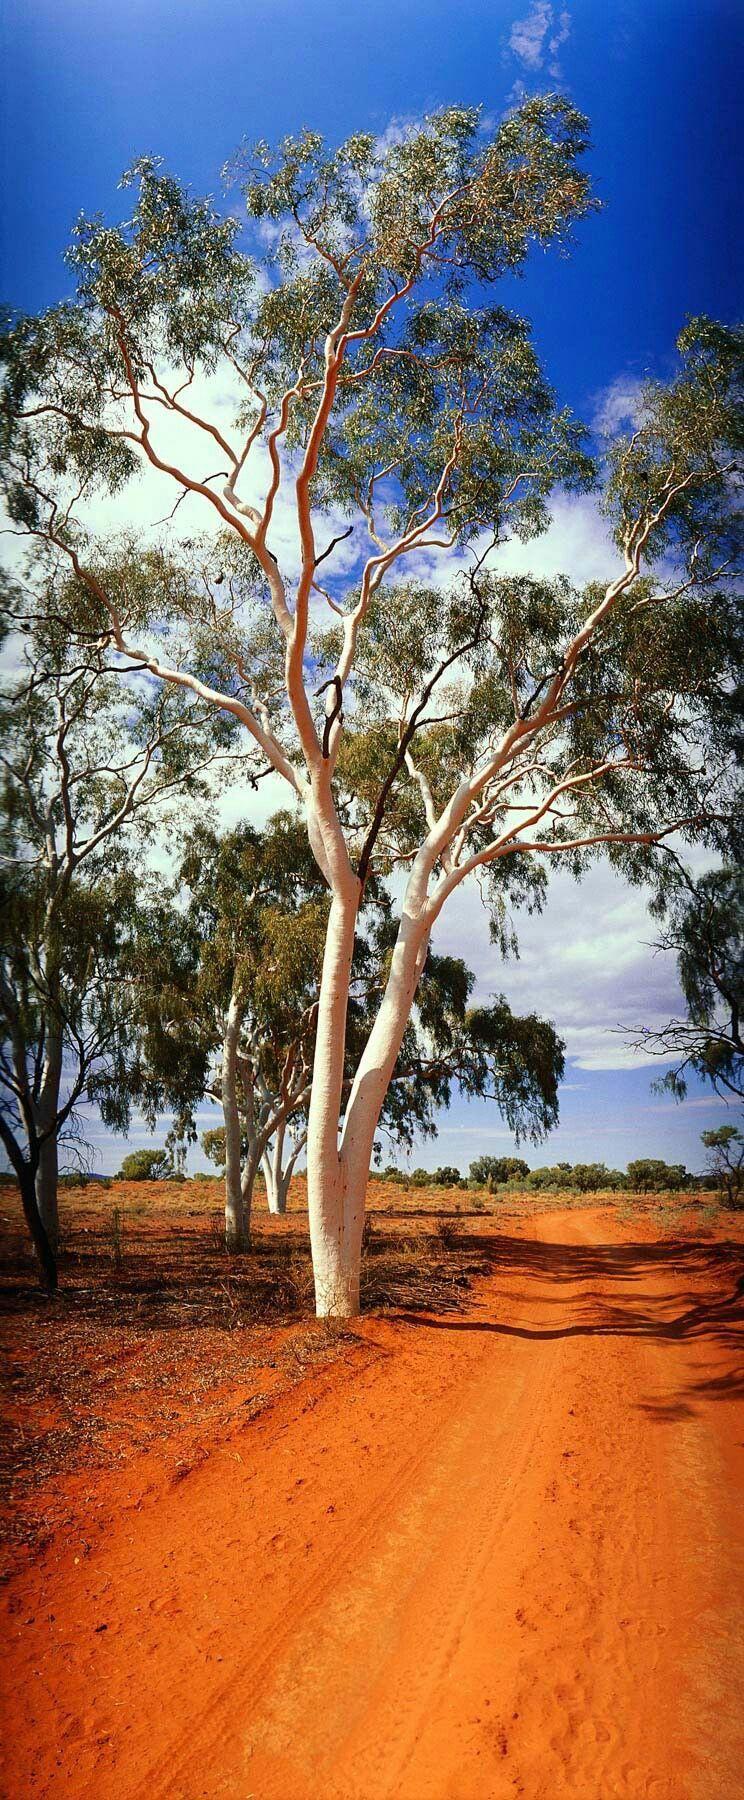 Australia The Iconic Gum Tree So Much To Love Westernaustraliatravel Western Australia Travel National Parks Australian Trees